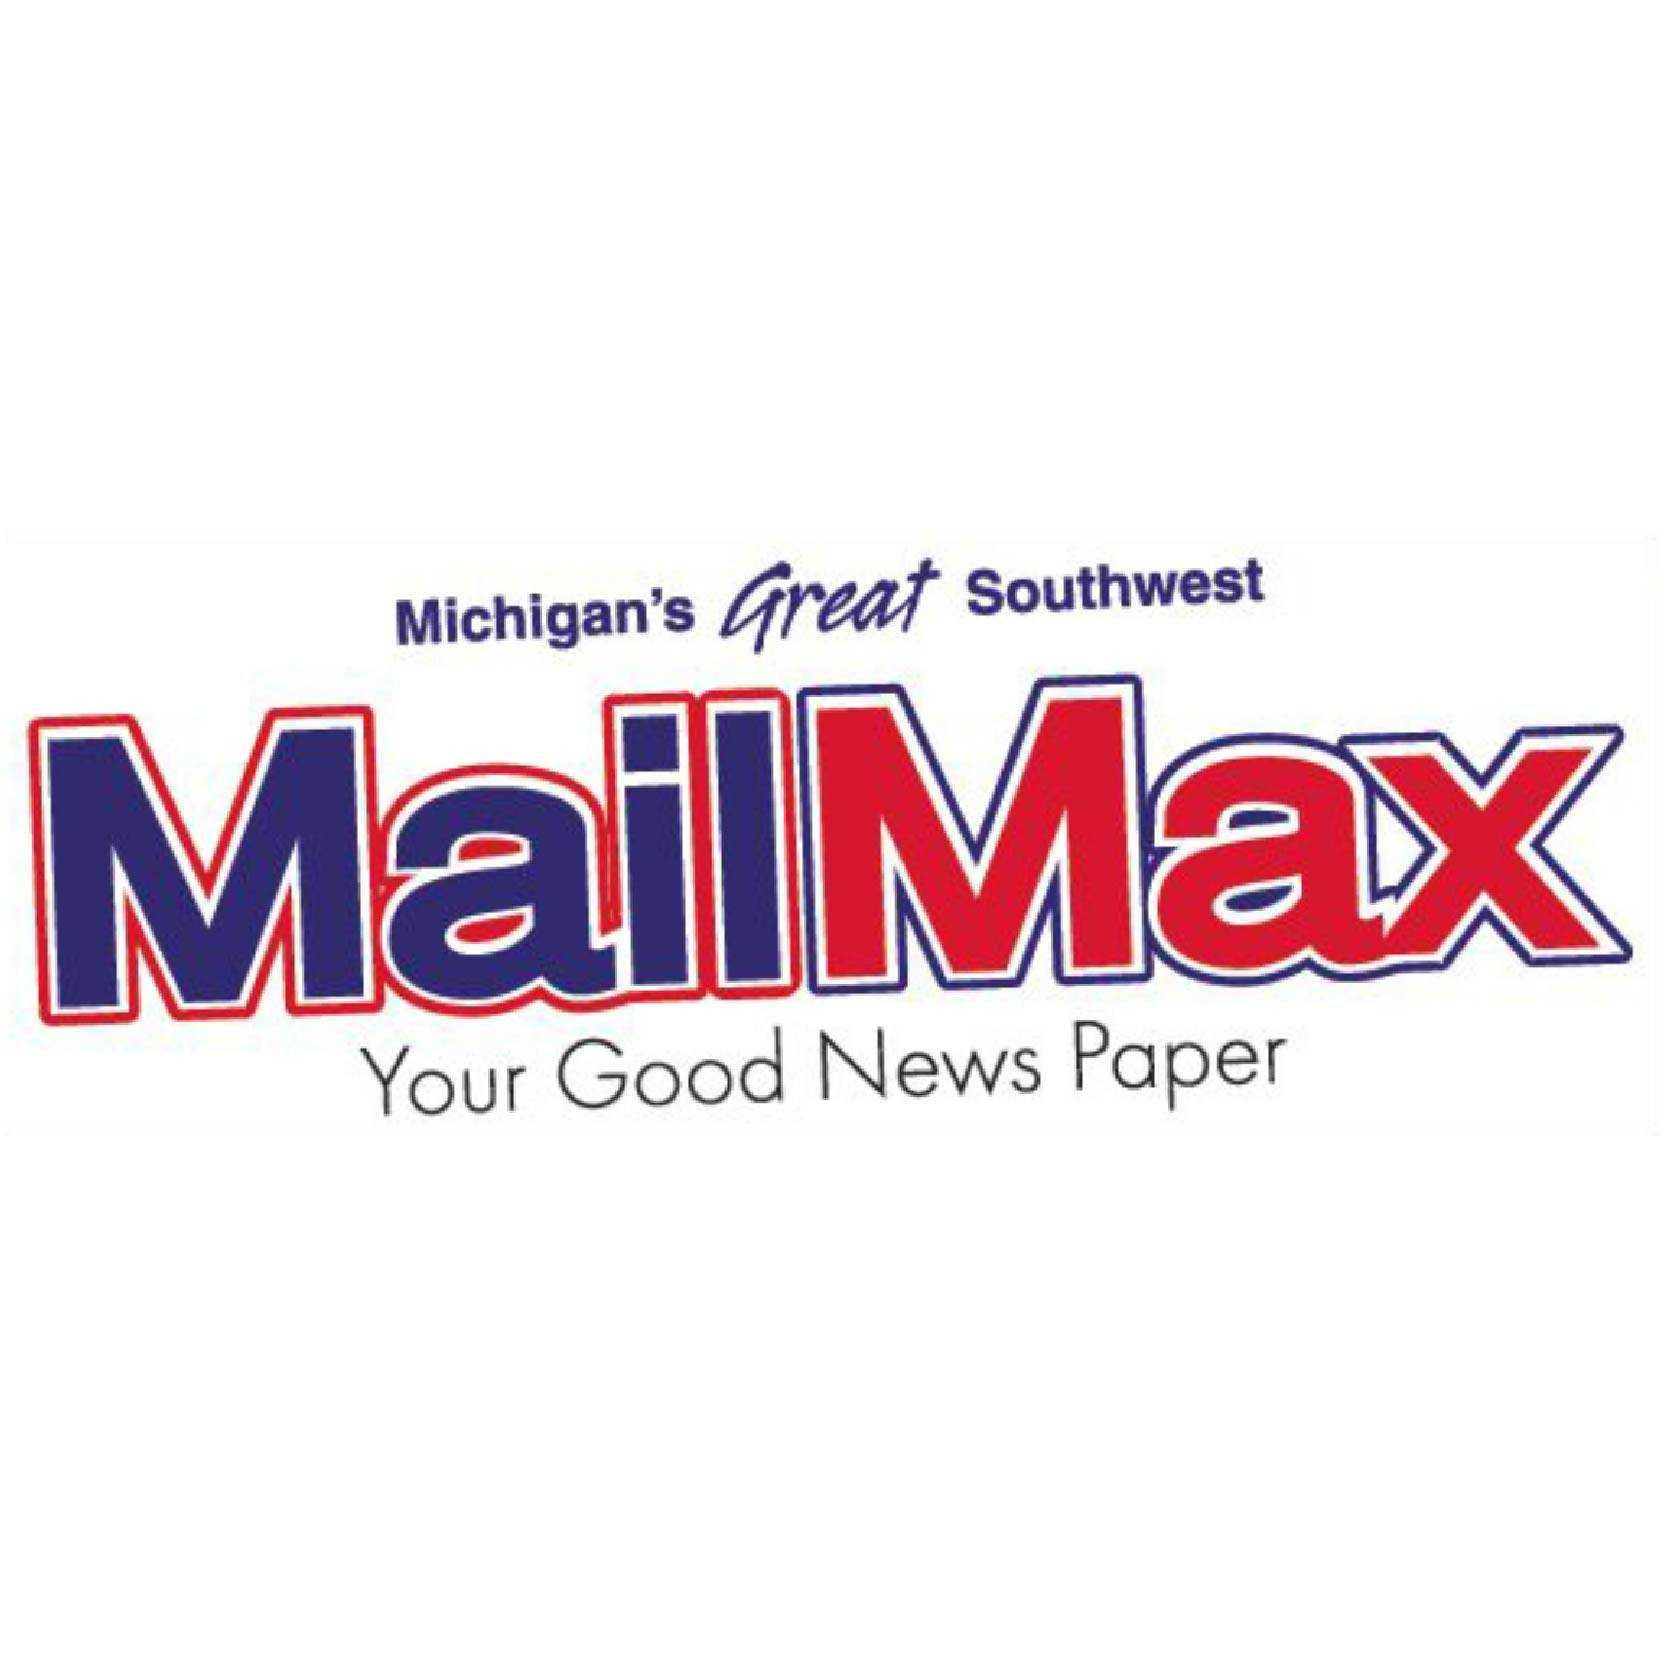 MailMax